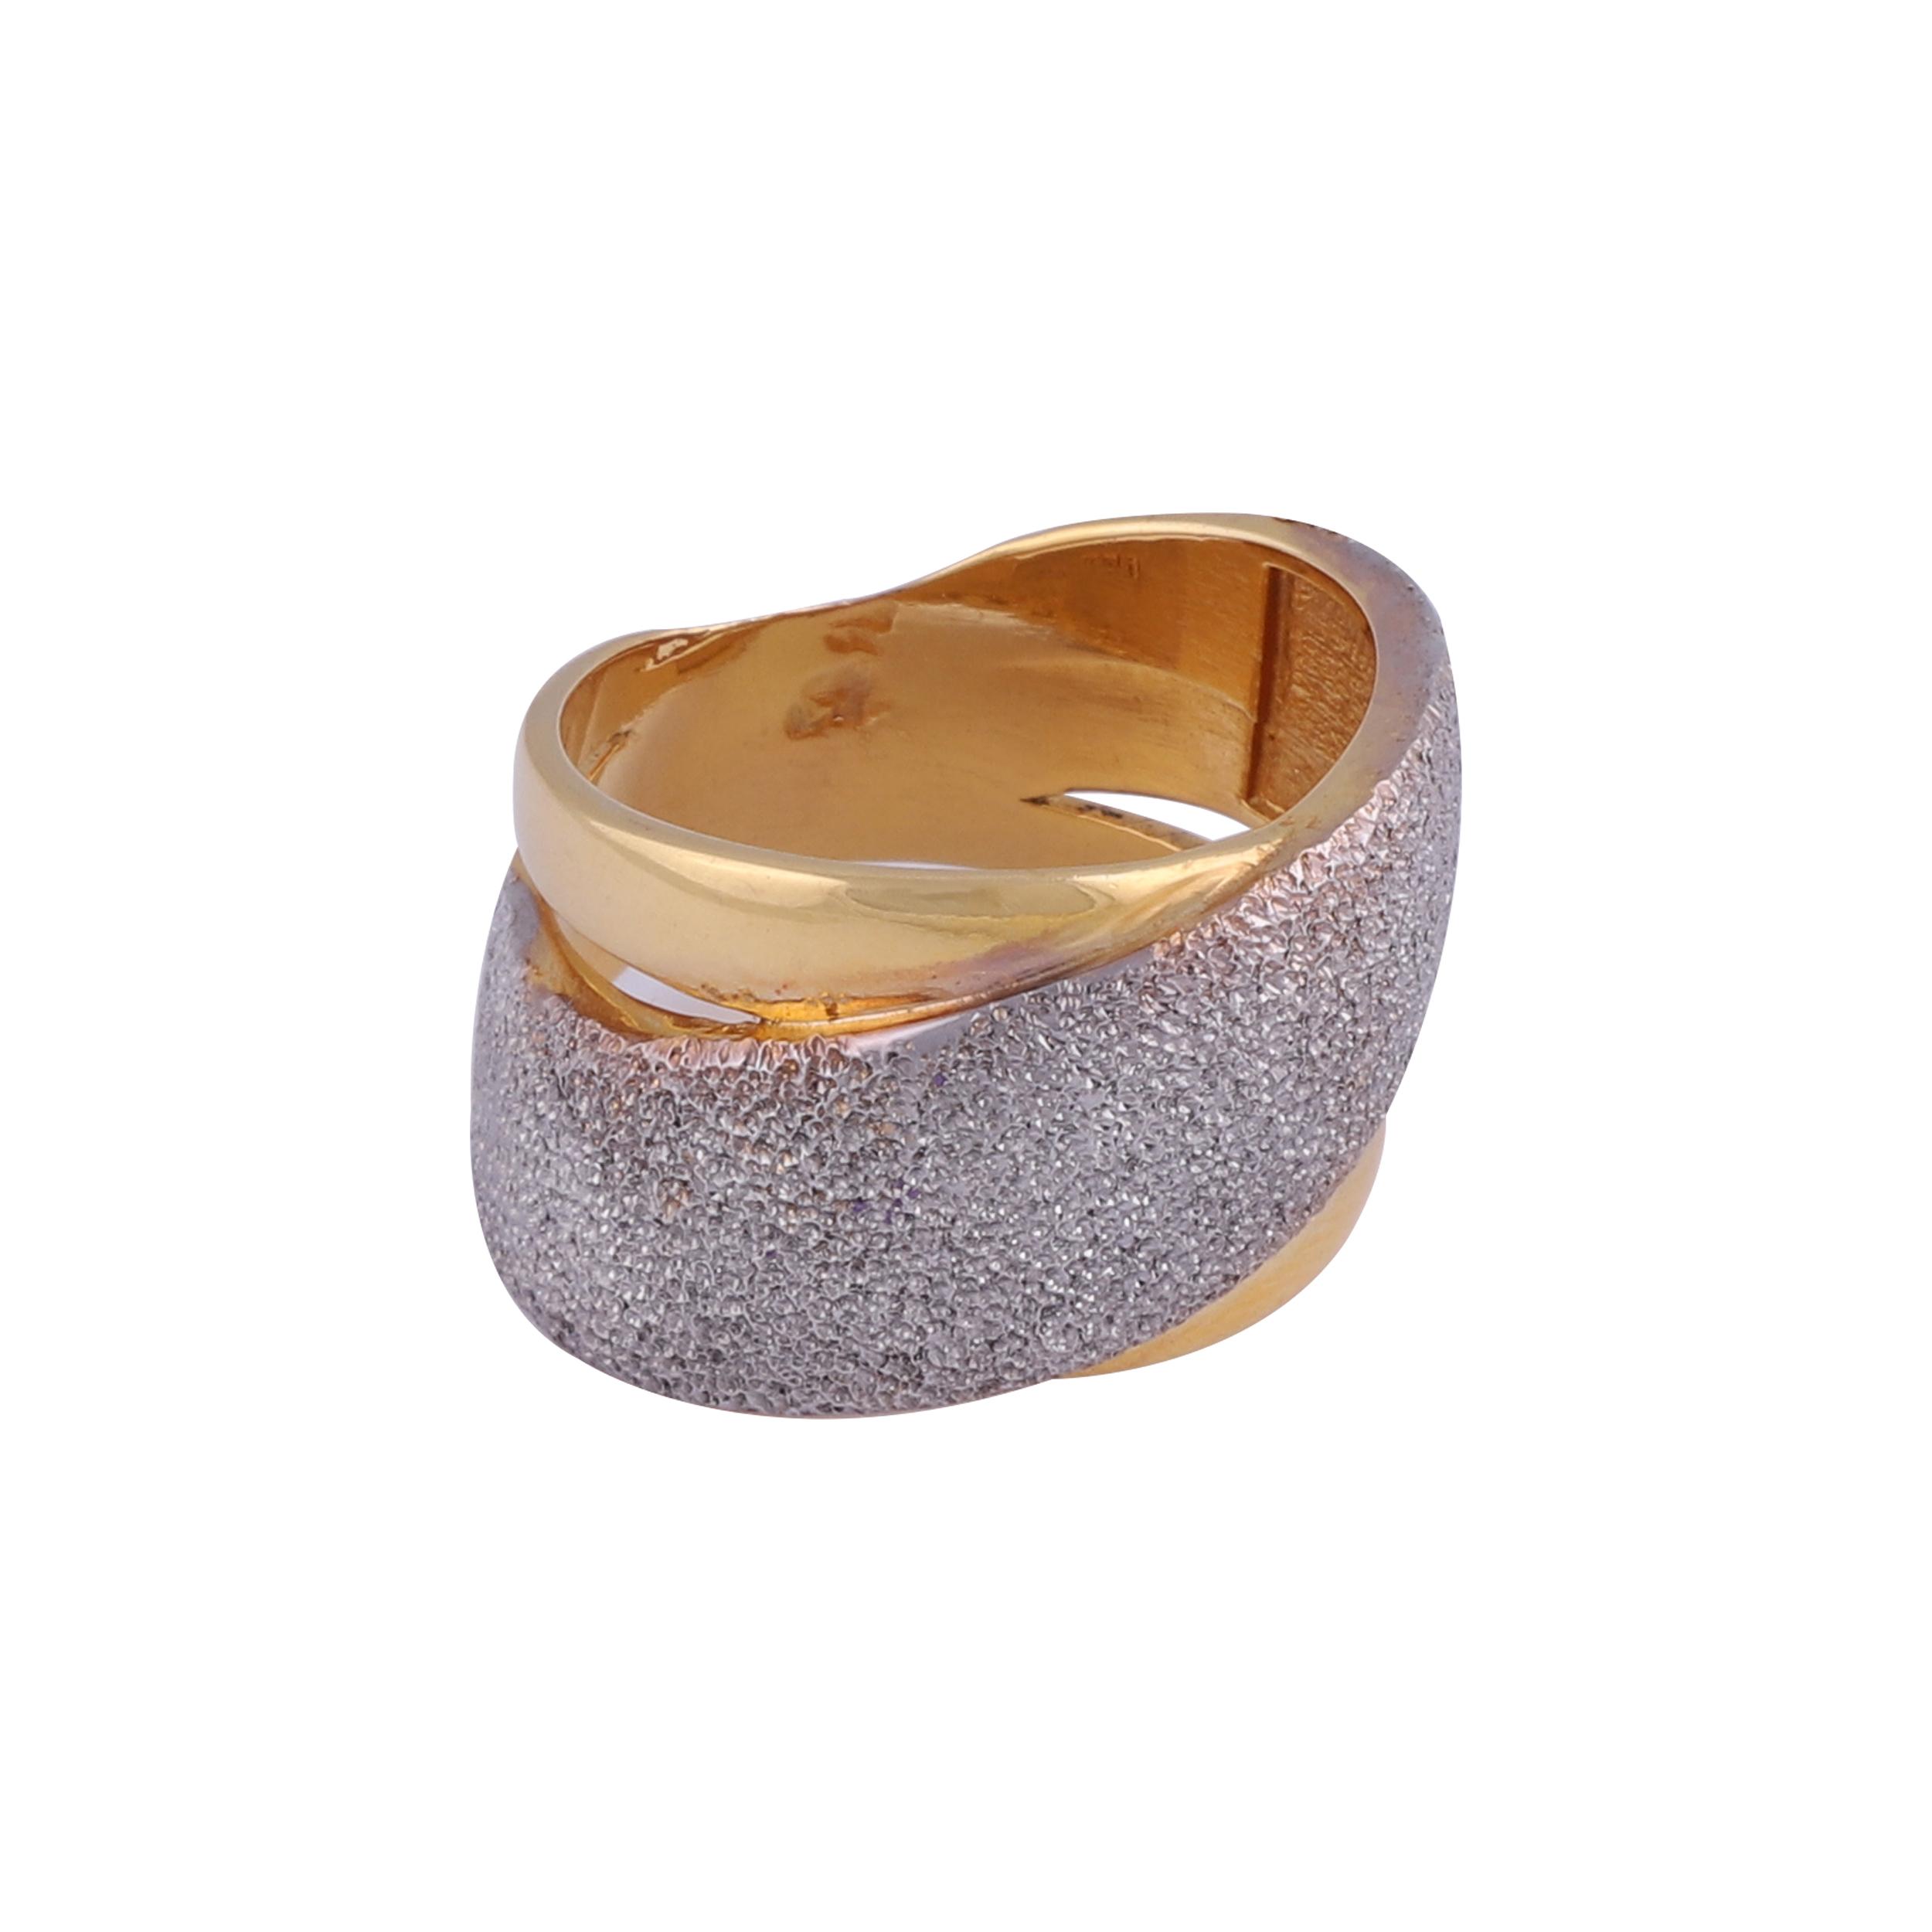 قیمت انگشتر طلا 18 عیار زنانه گوی گالری کد G366